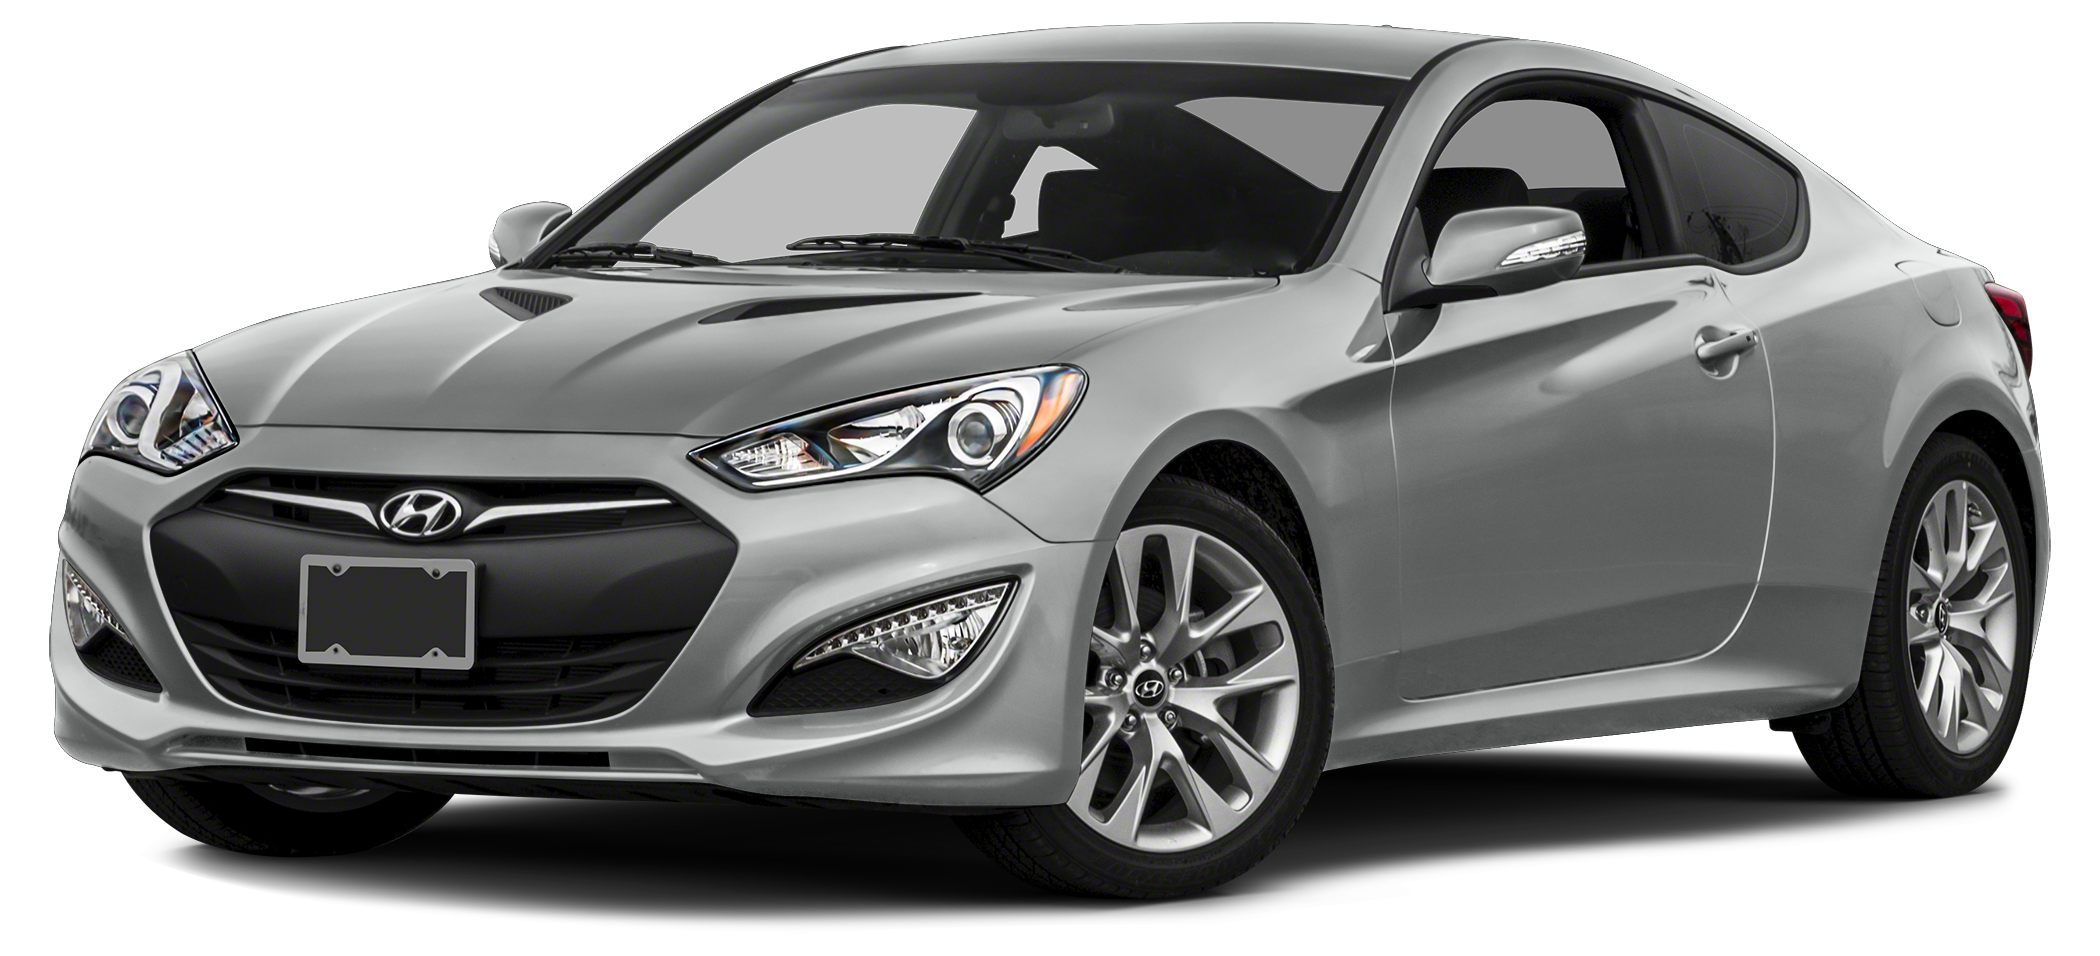 2015 Hyundai Genesis Coupe 38 Miles 1550Color Santiago Silver Stock M6270 VIN KMHHU6KJ8FU12